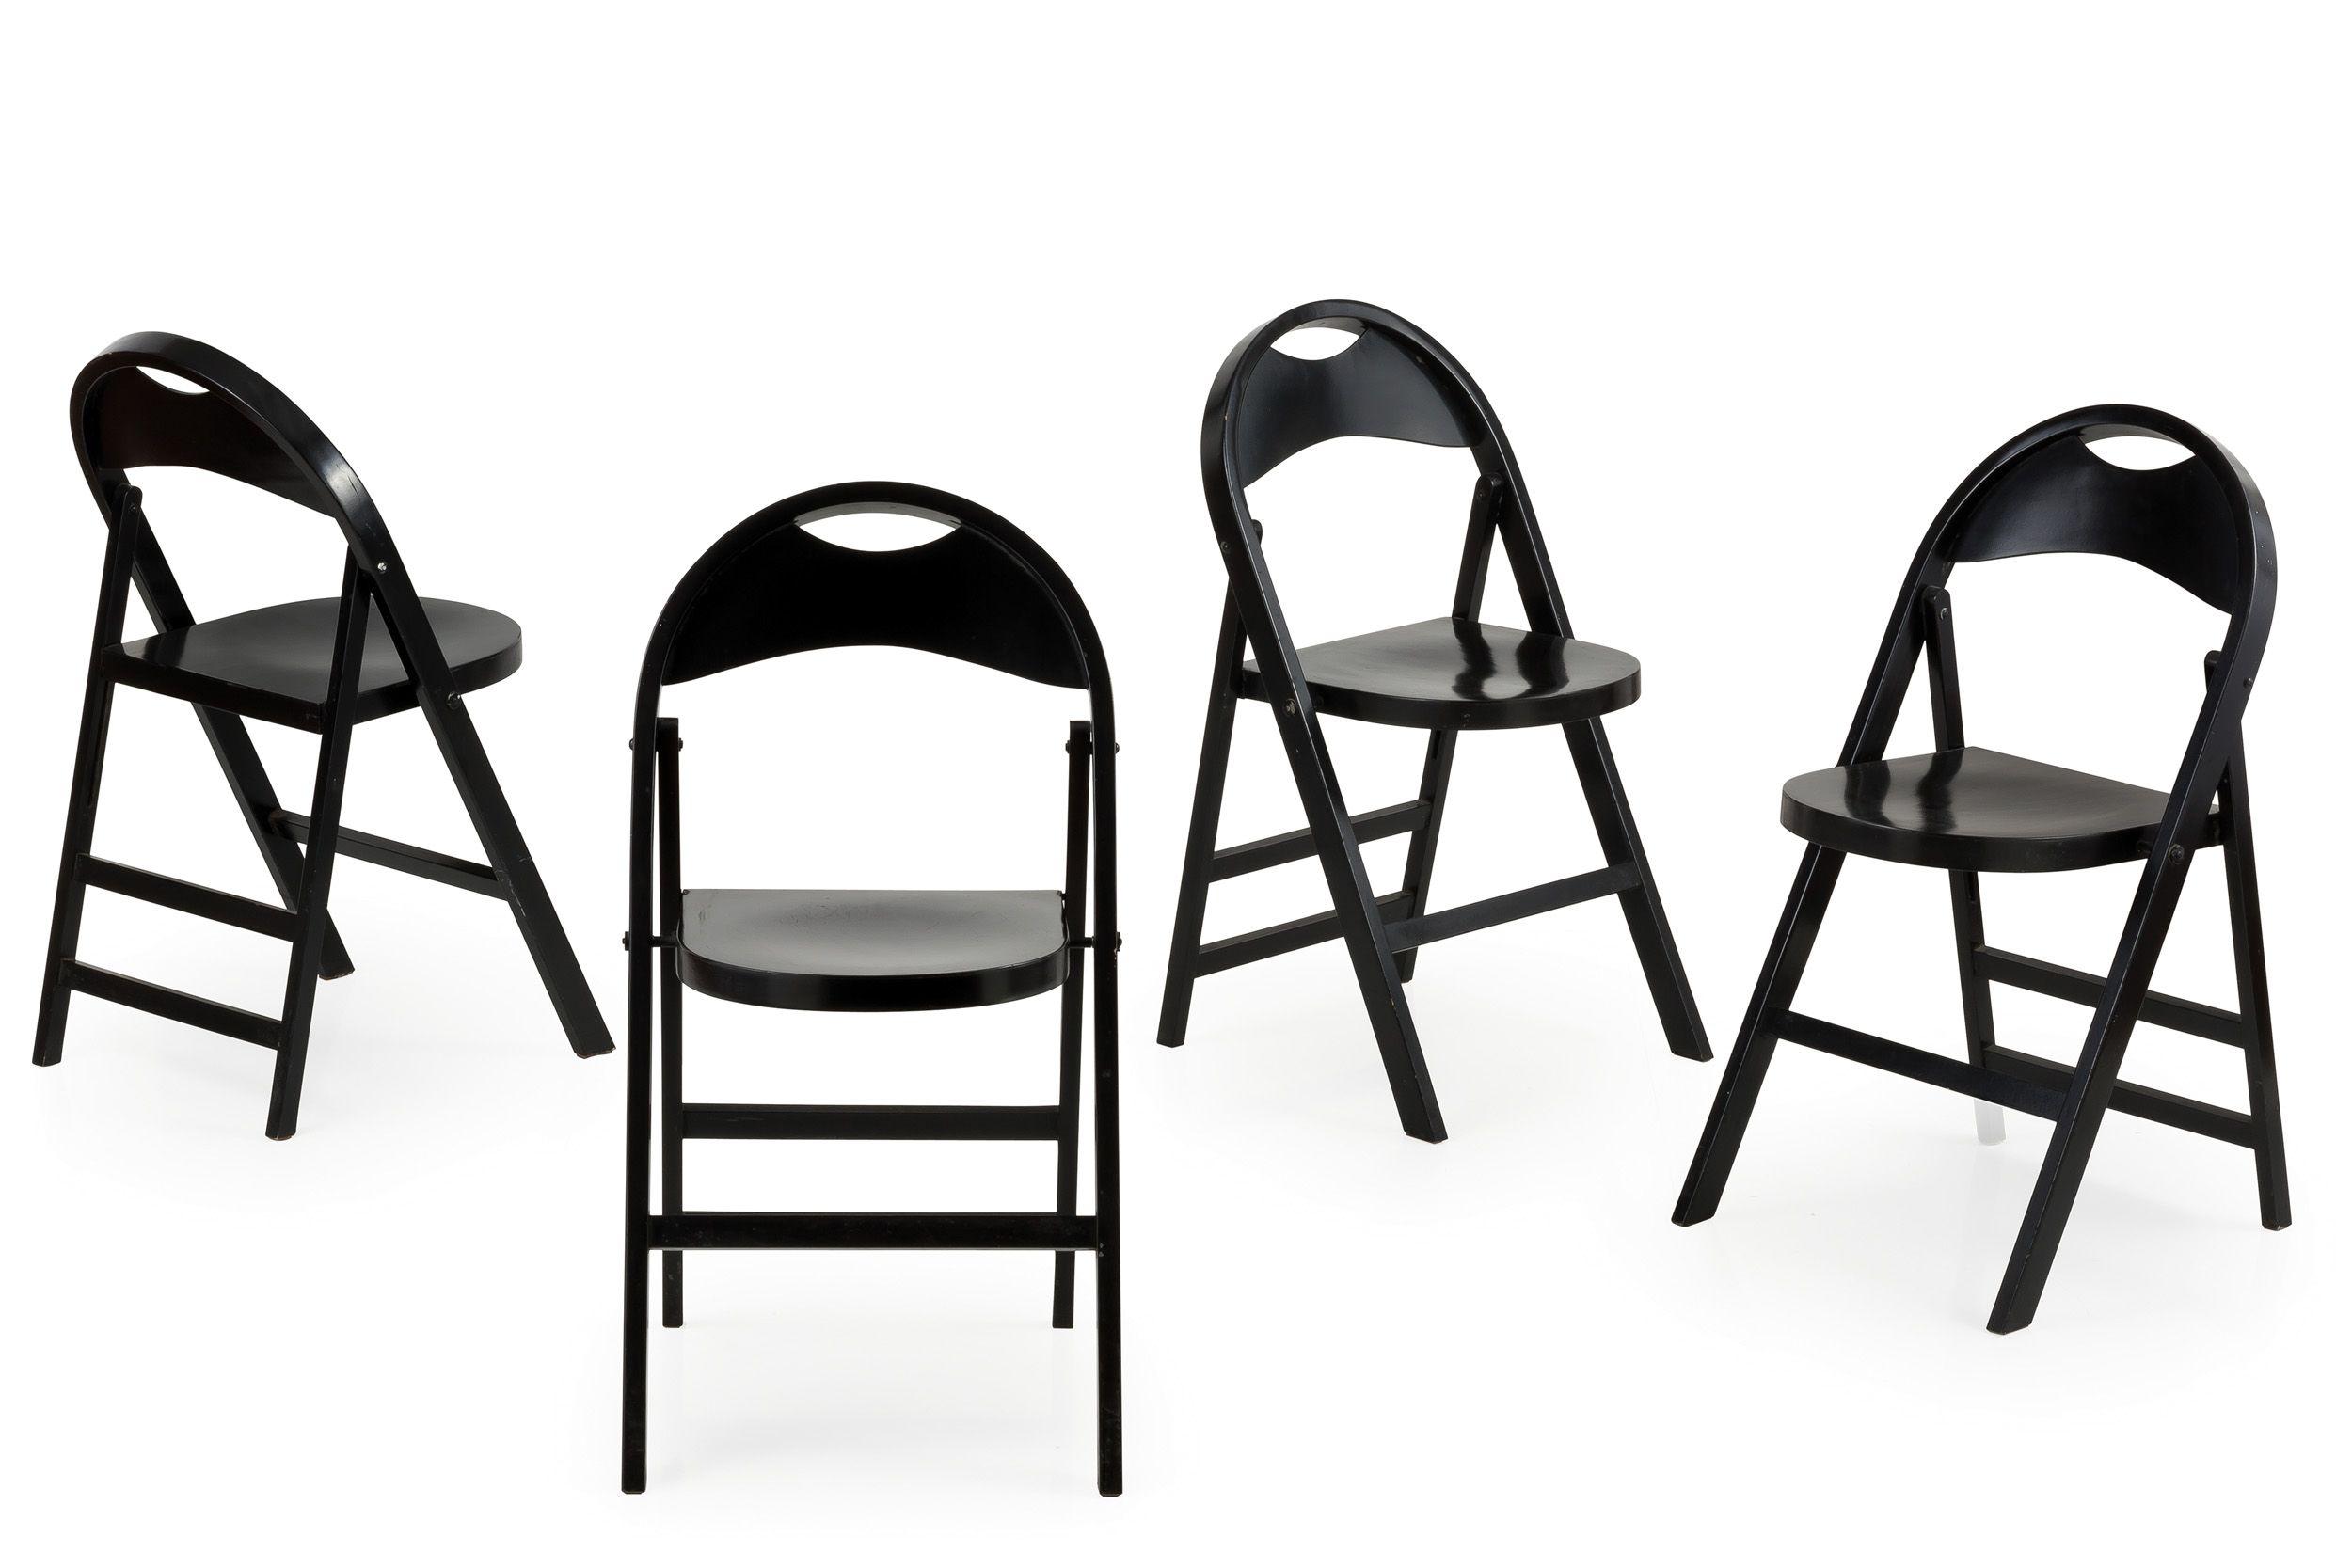 TRIC chair by Achille Castiglioni  Collection: Richard Hutten